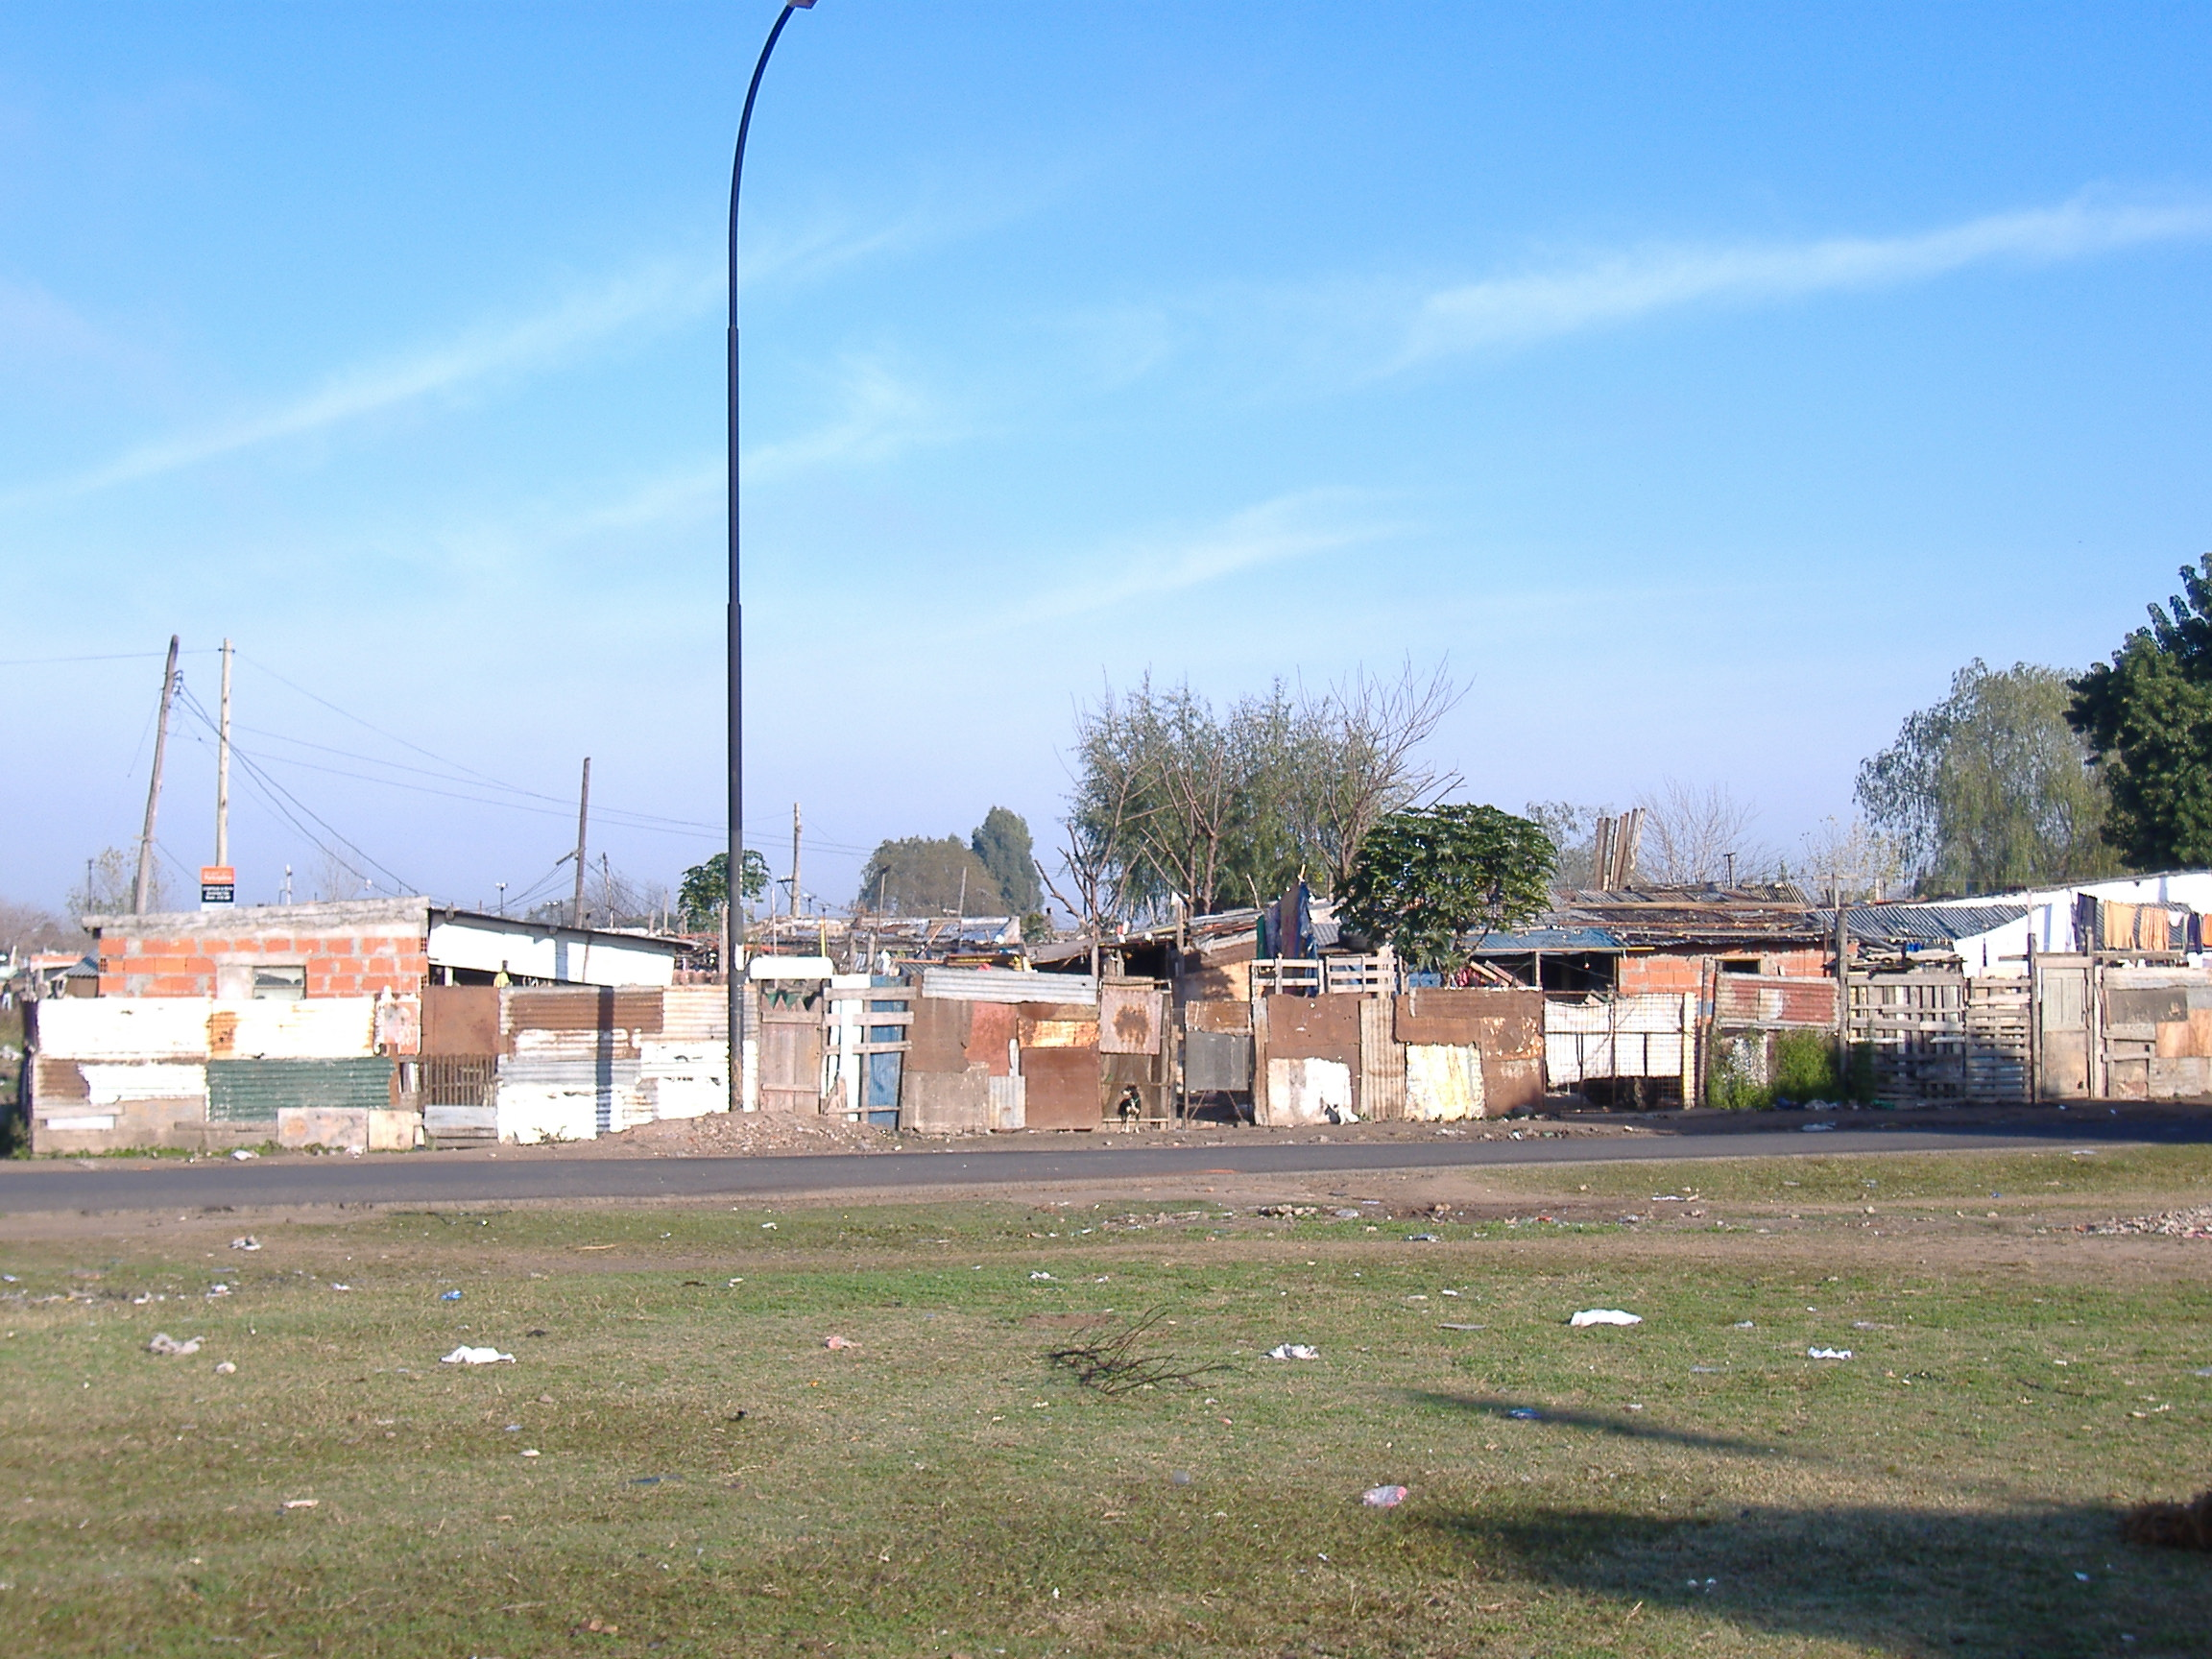 Villa miseria wikiwand for Villas miserias en argentina